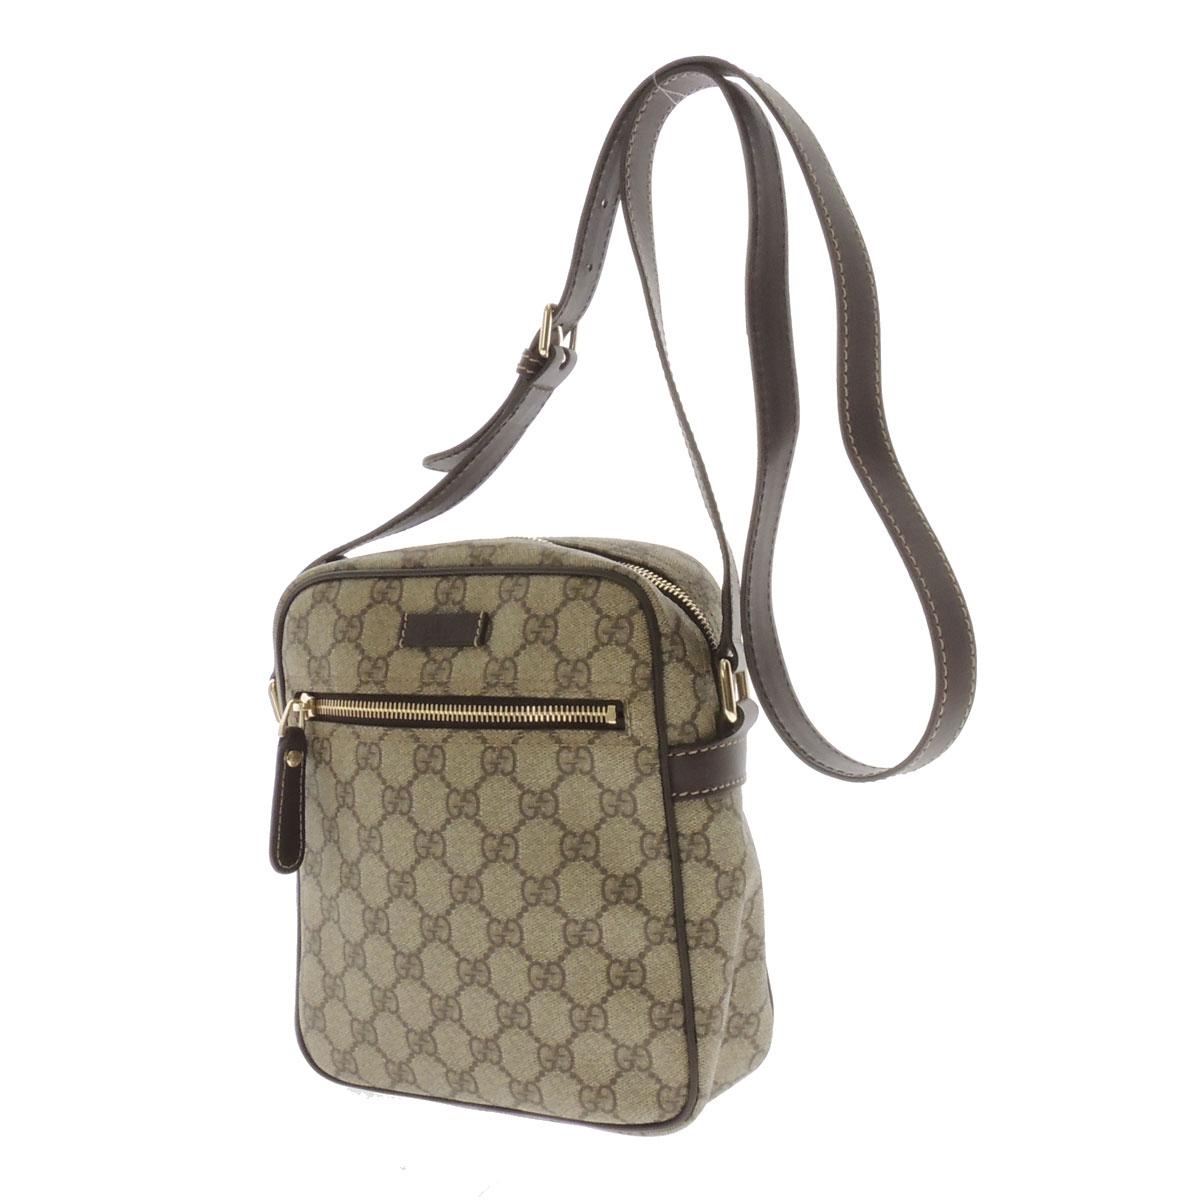 GUCCIGG handle tiny shoulder bag PVCx leather unisex